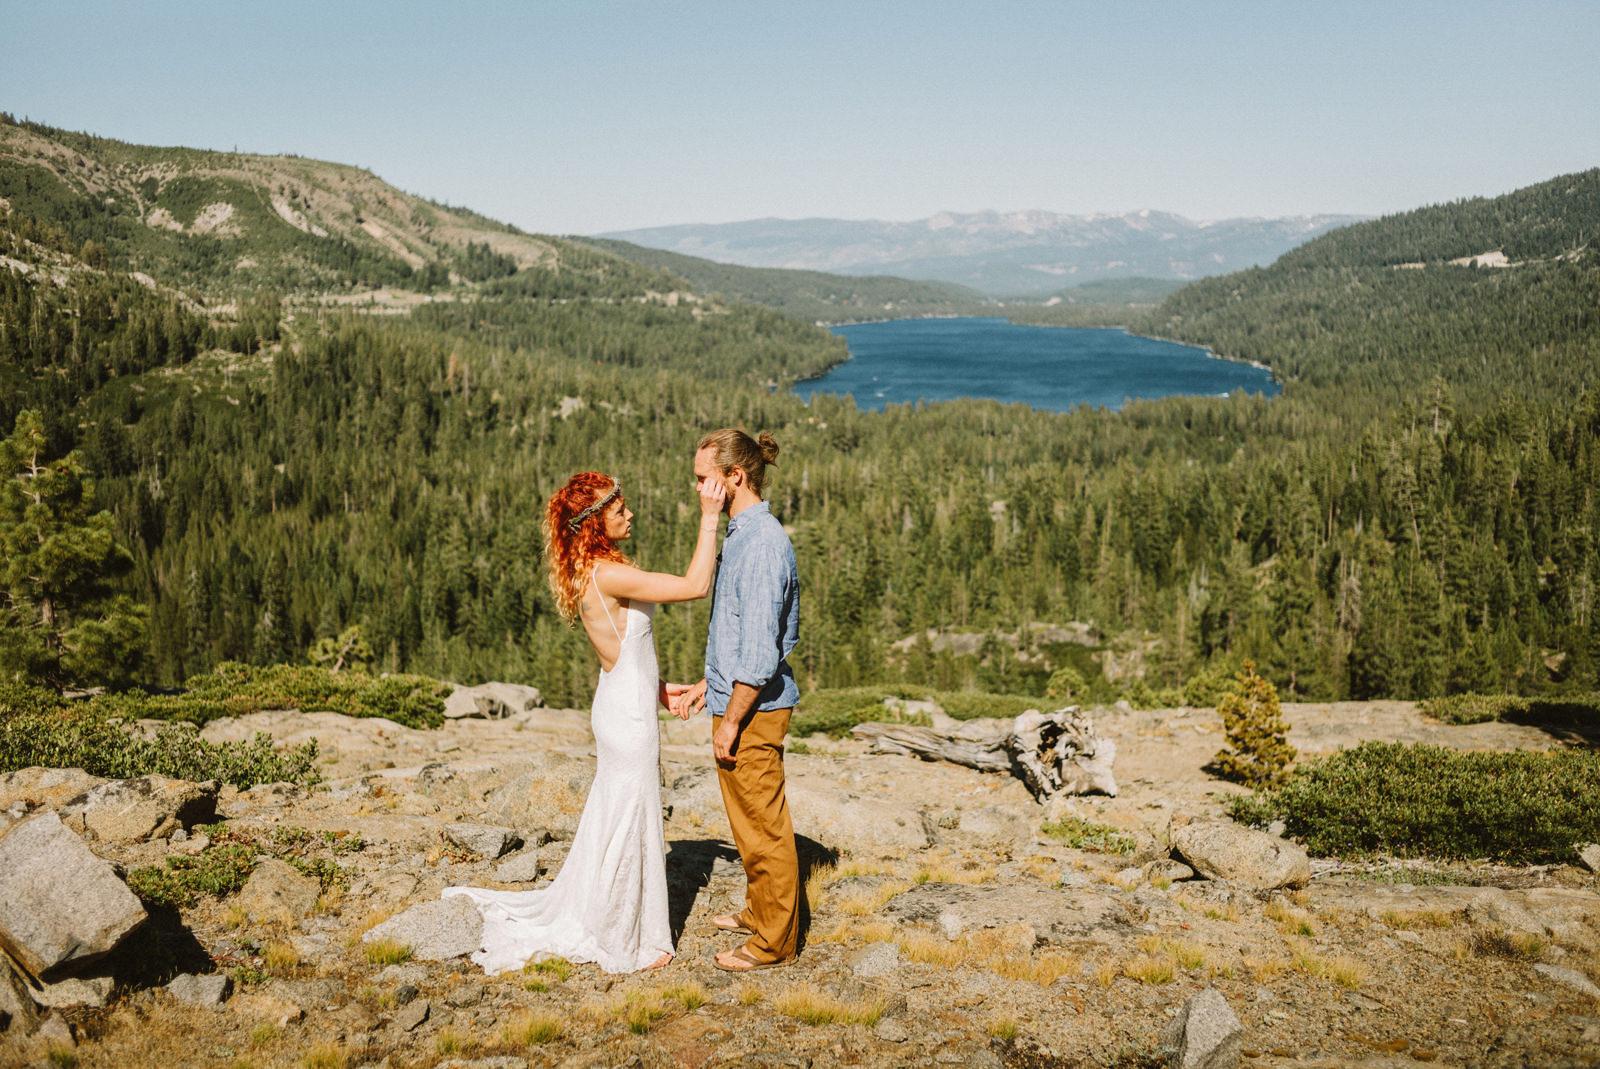 lake-tahoe-elopement-028 LAKE TAHOE ELOPEMENT